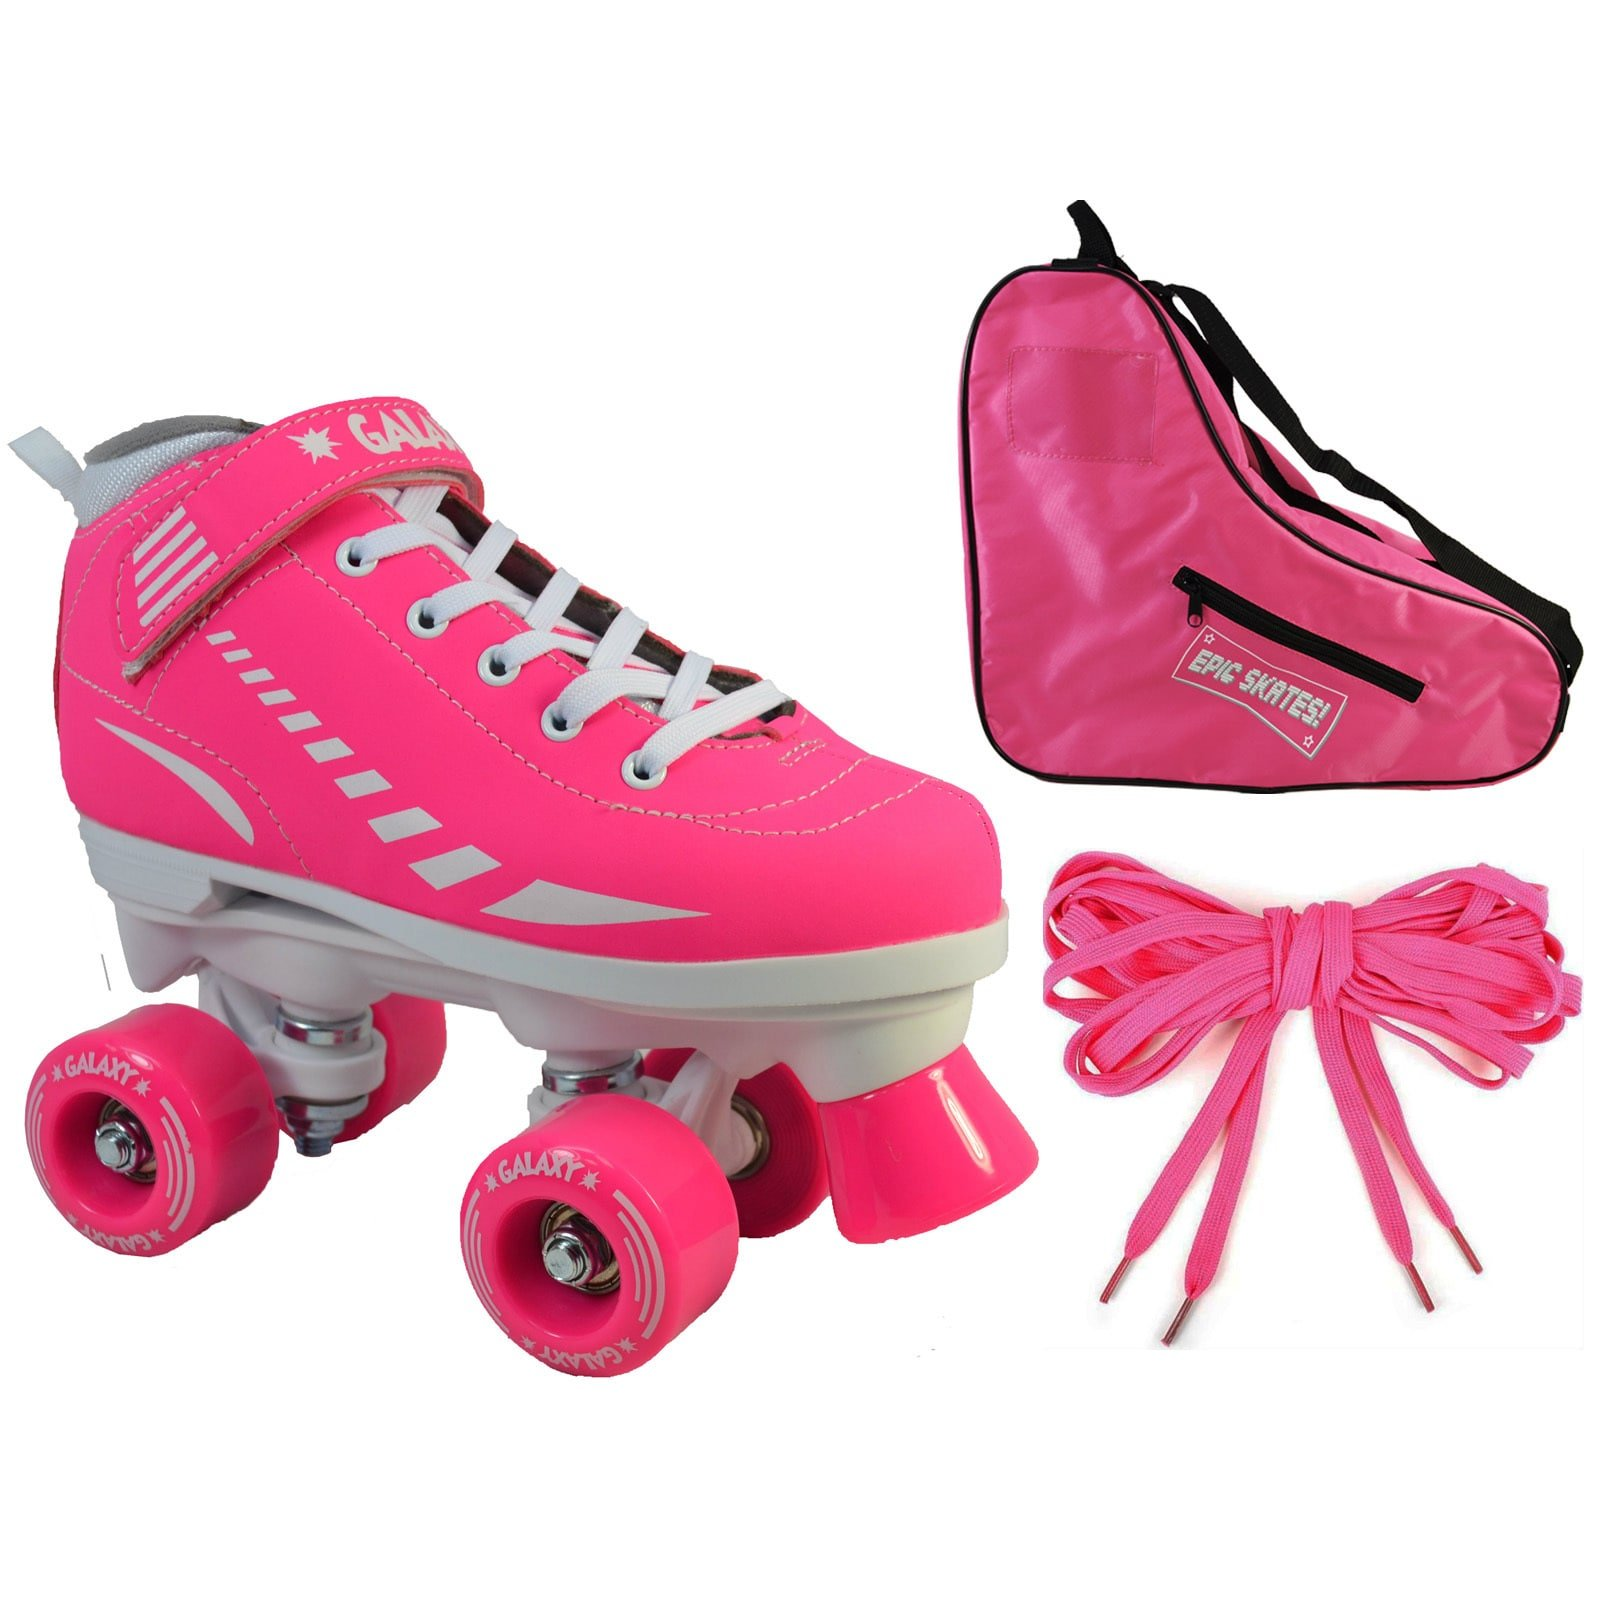 Epic Skates Epic Pink Galaxy Elite Quad Roller Skate 3-piece Bundle 2